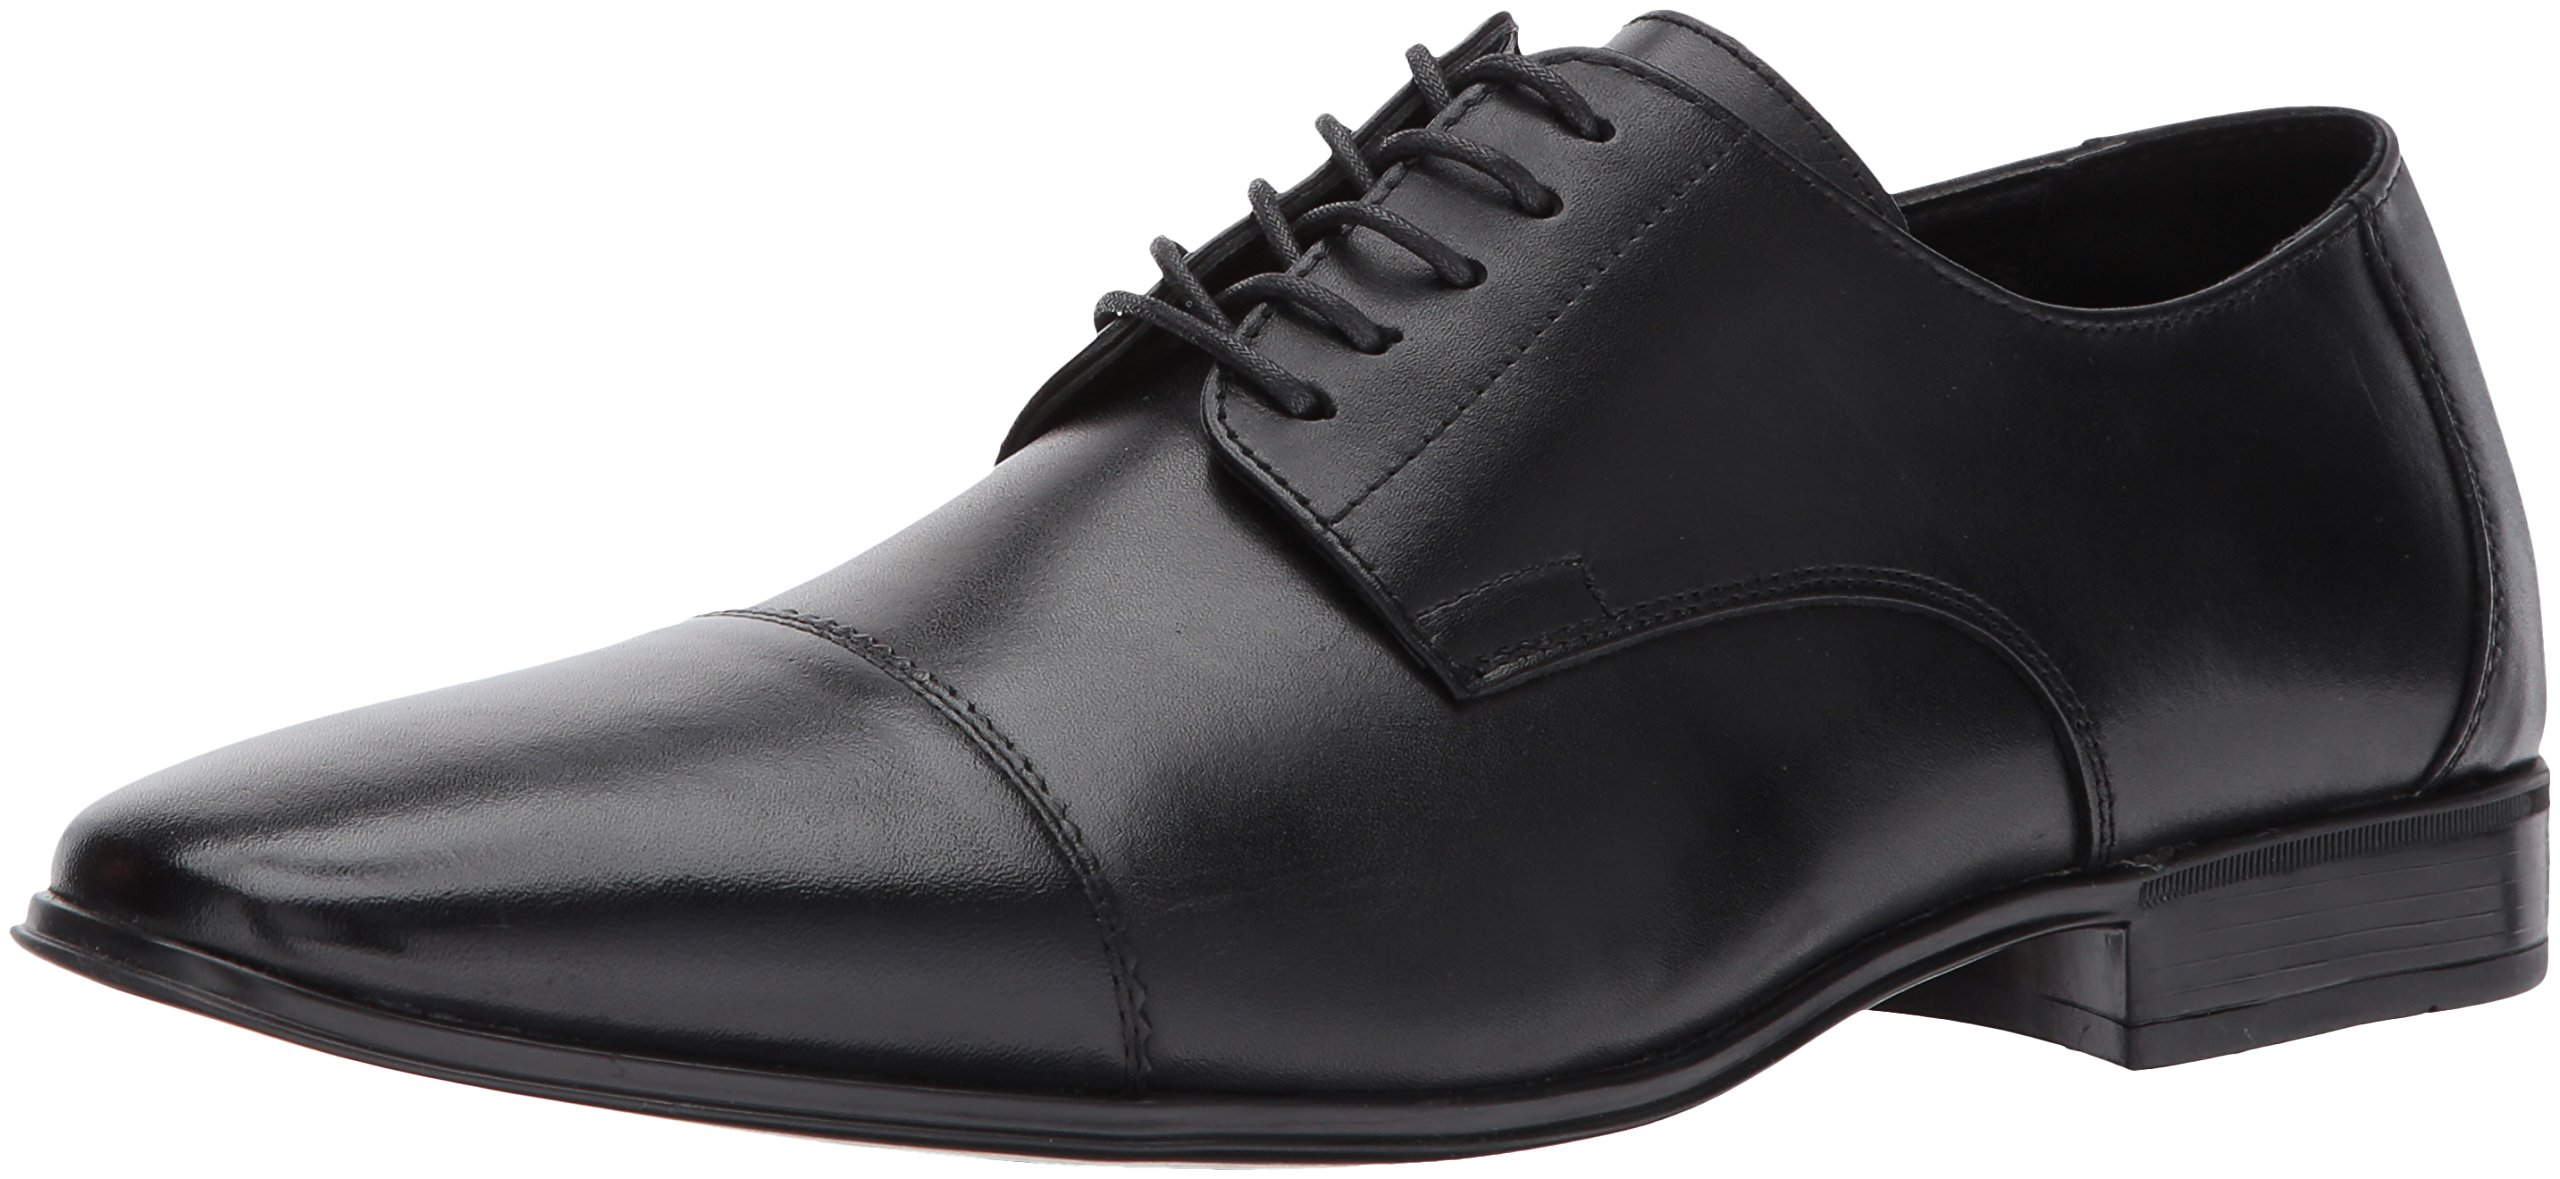 Giorgio Brutini Men's Sheppard Oxford, Black, 9 Medium US